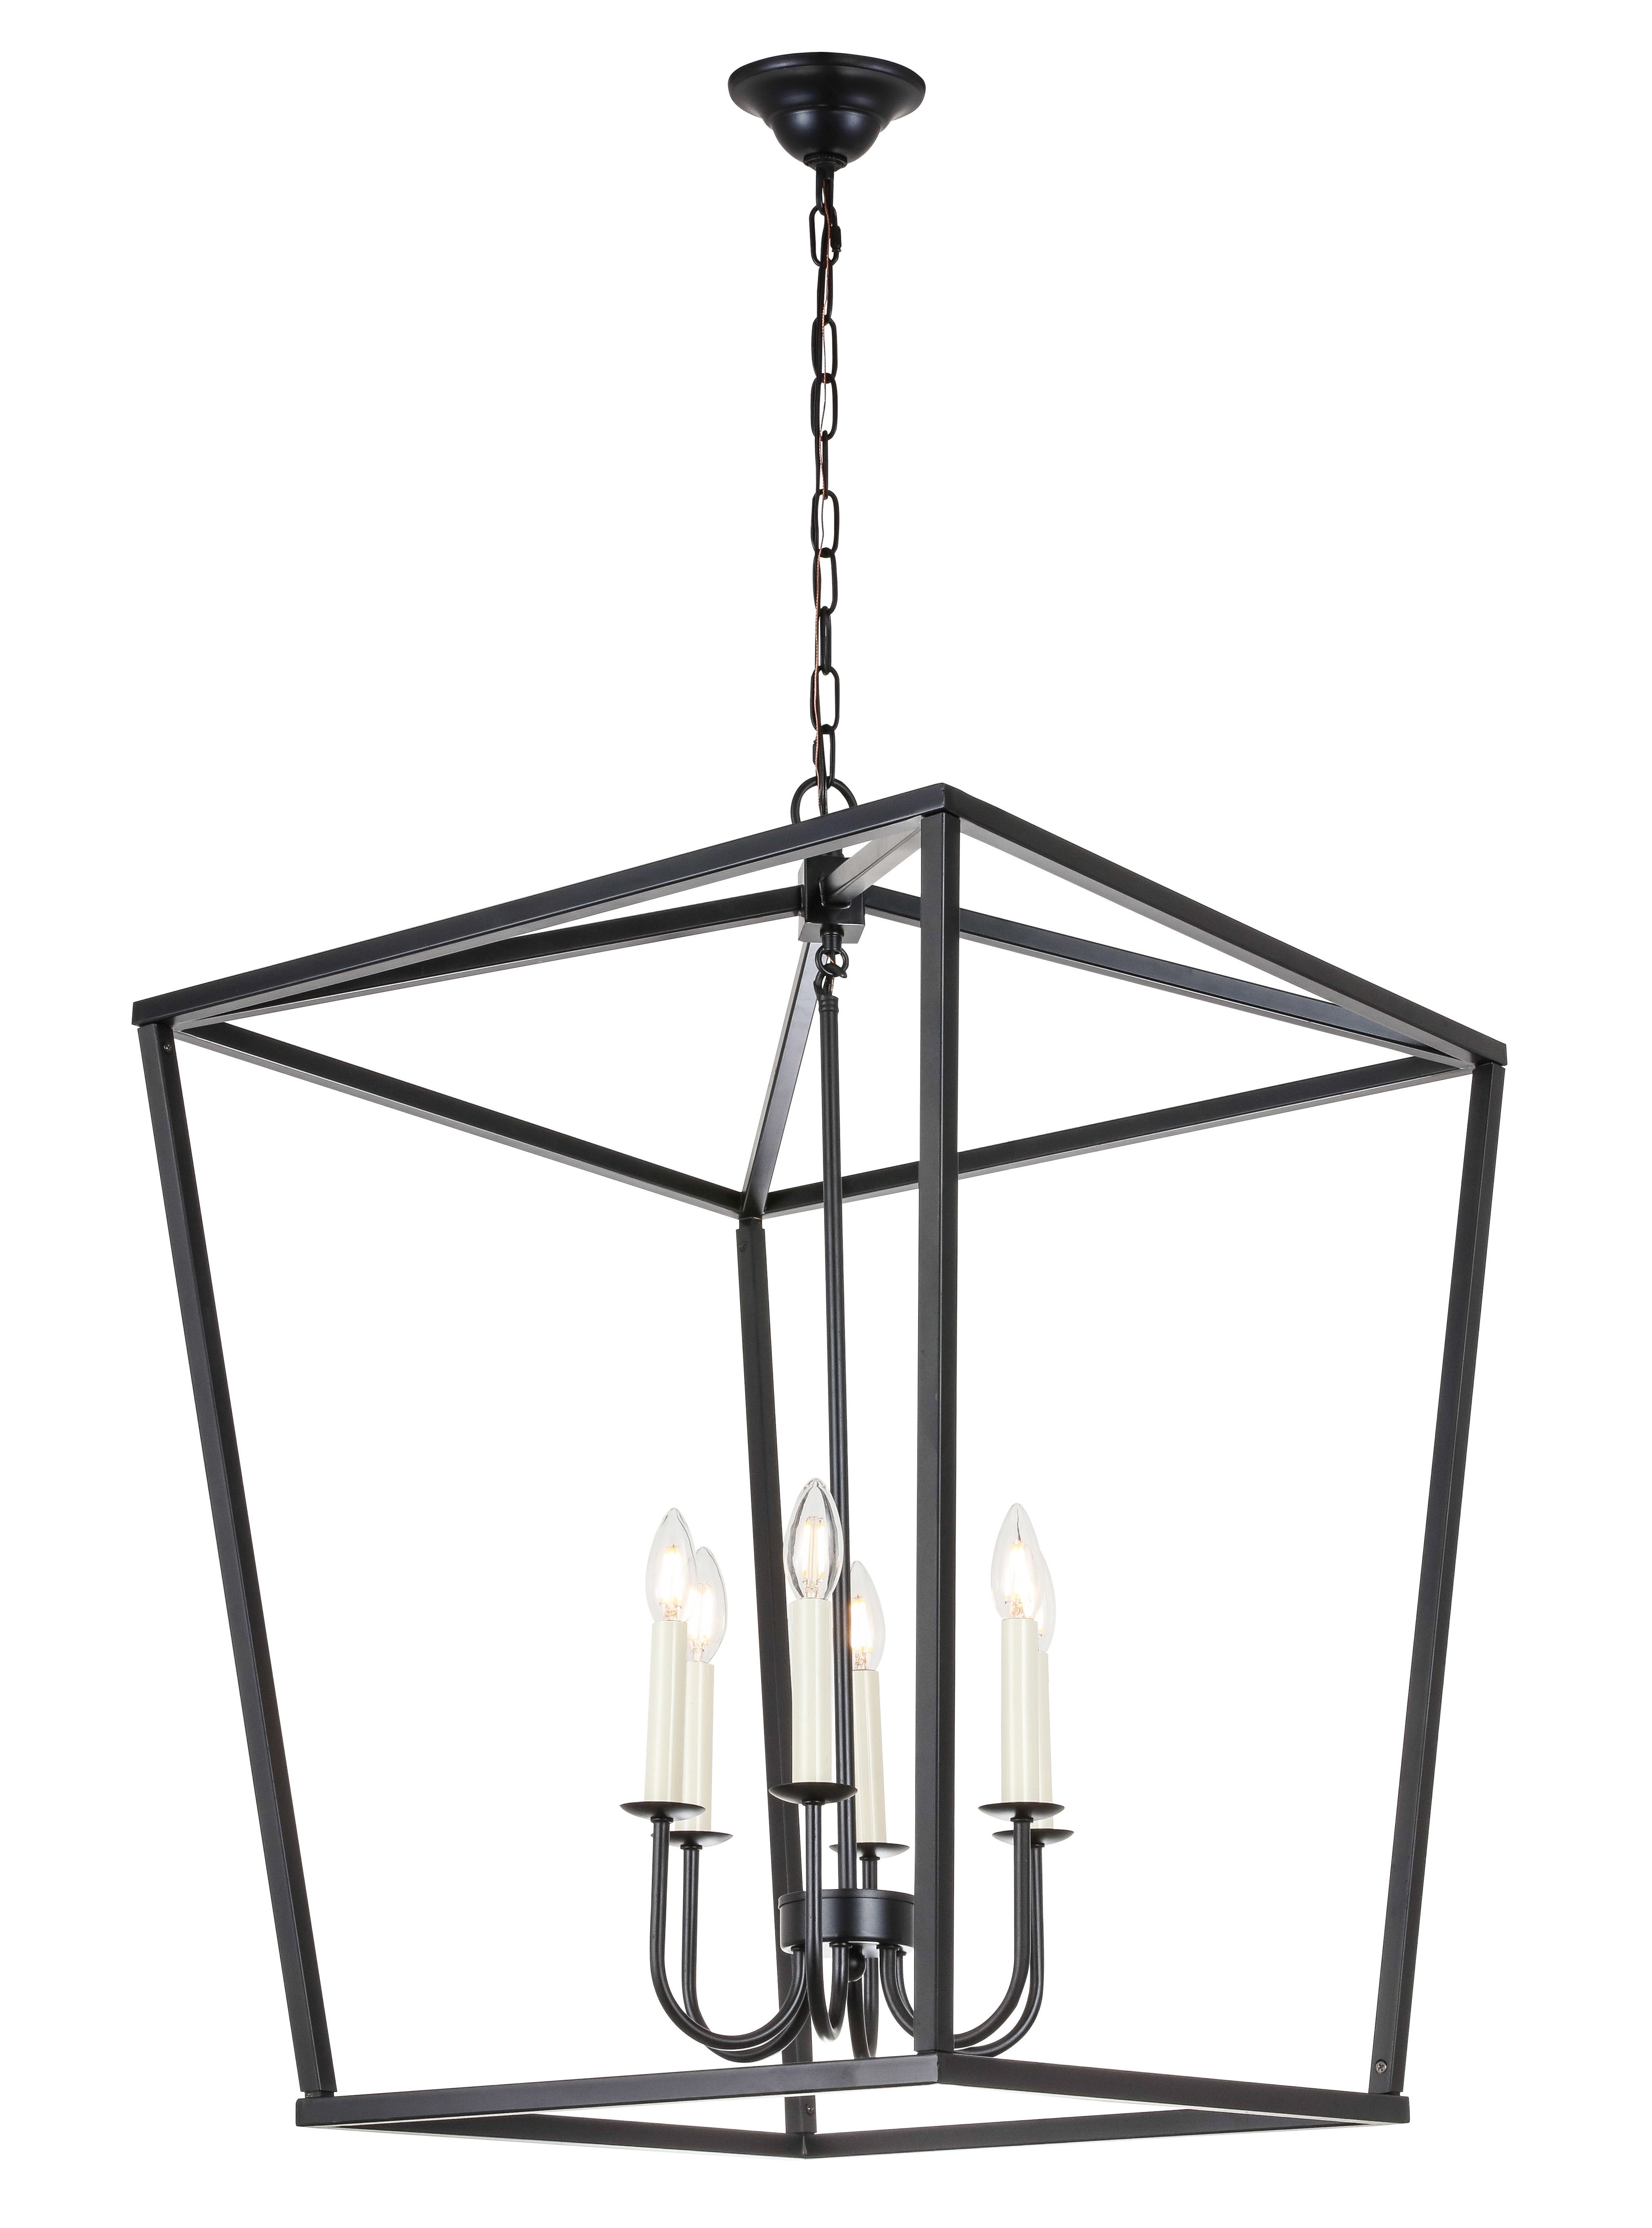 Best And Newest Tanguay 6 Light Lantern Pendant Throughout Carmen 6 Light Lantern Geometric Pendants (View 18 of 25)